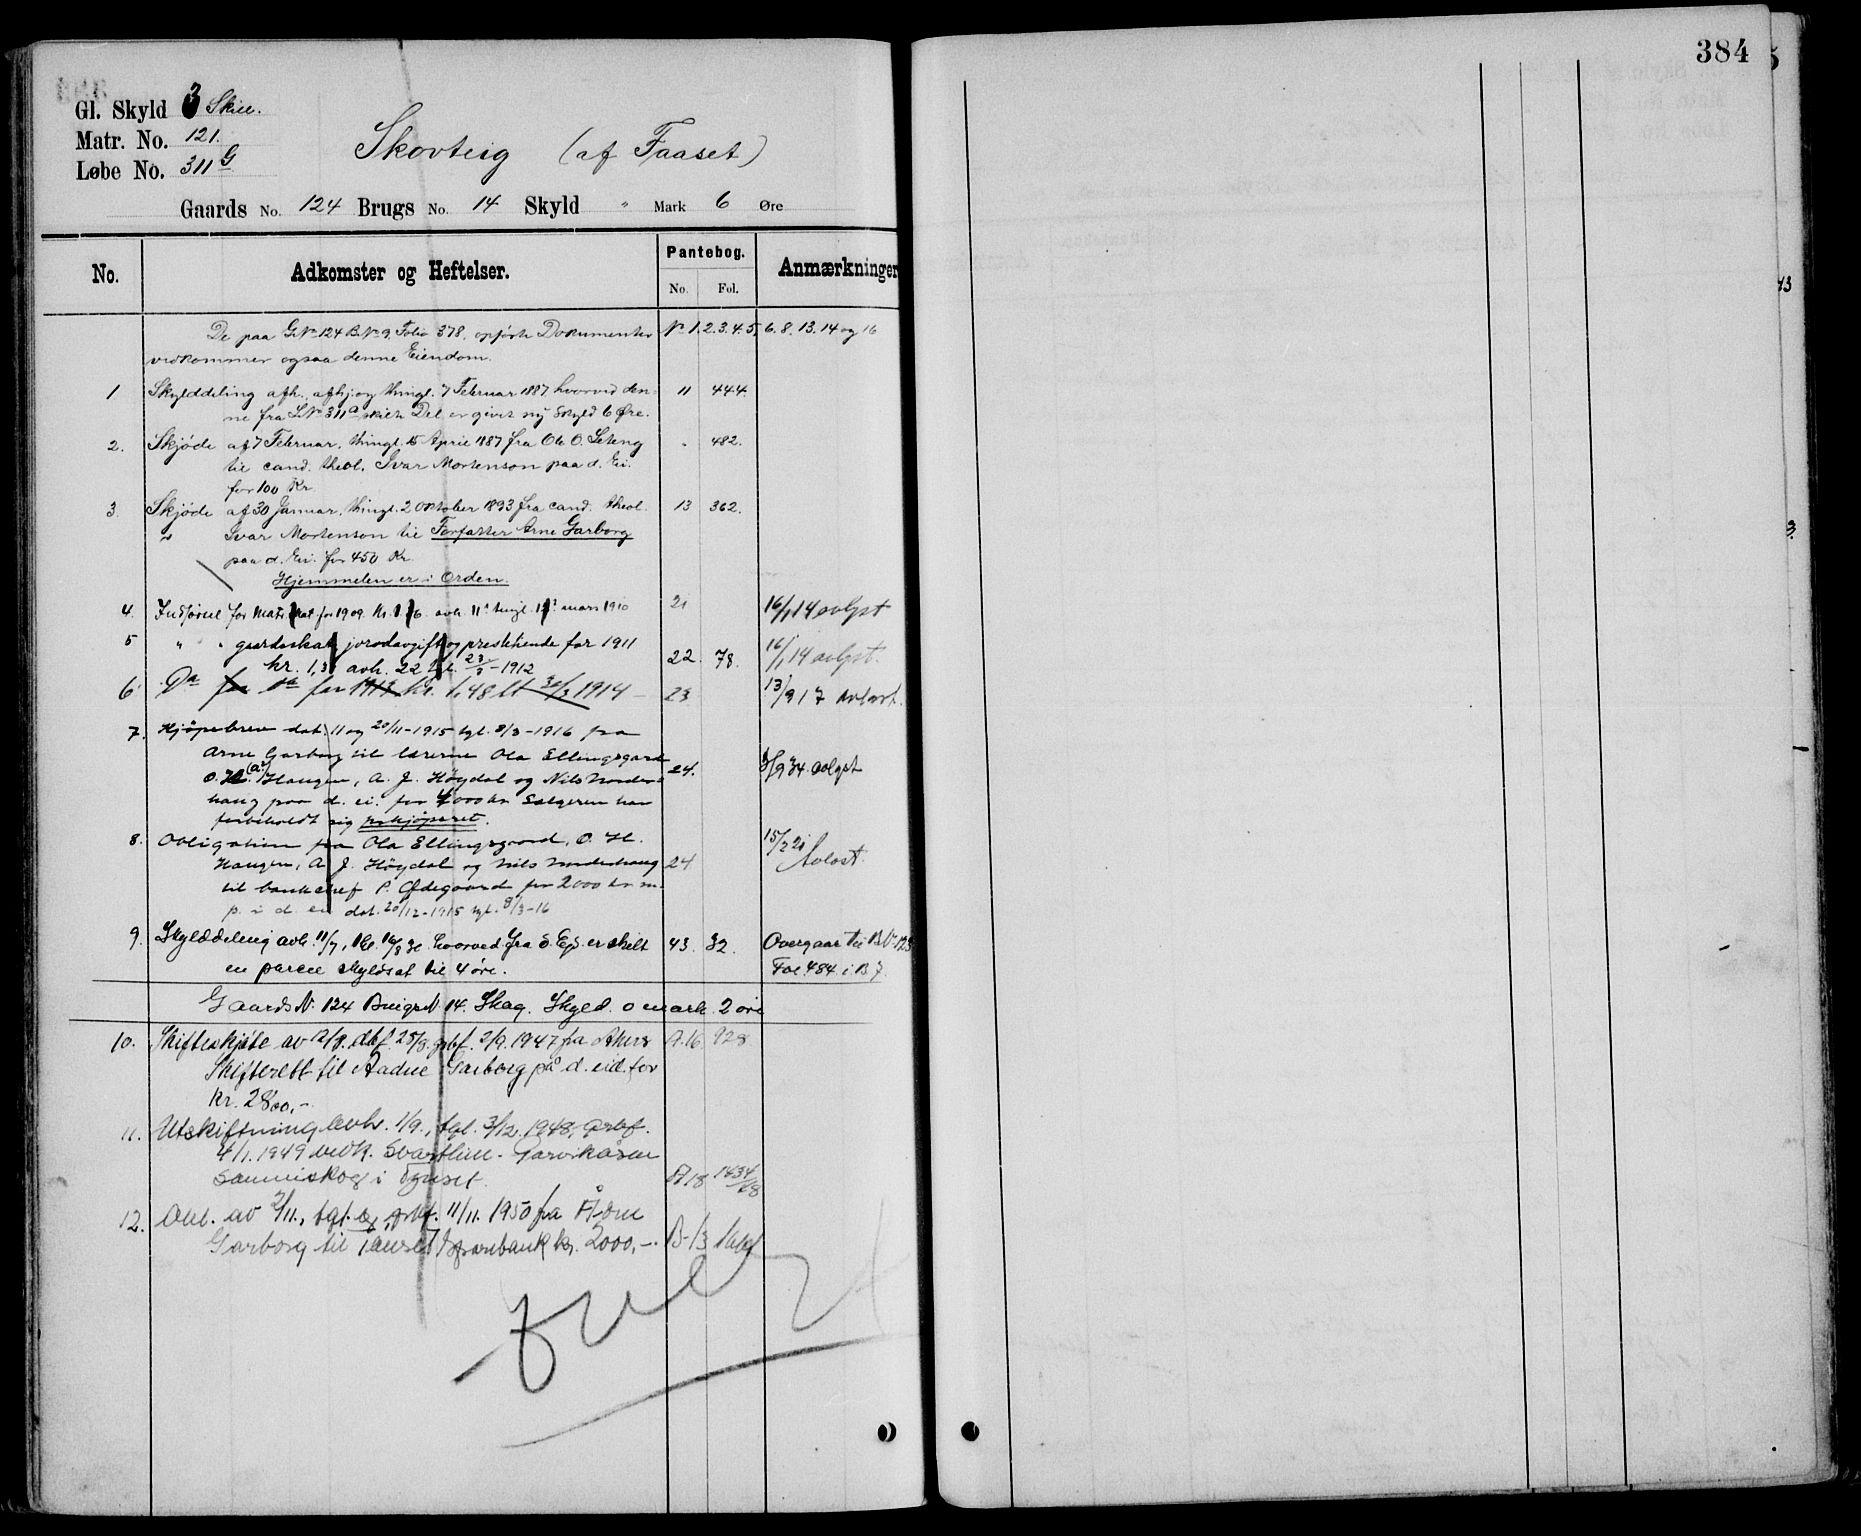 SAH, Nord-Østerdal tingrett, H/Ha/Hag/L0041: Panteregister nr. 5, 1896, s. 384